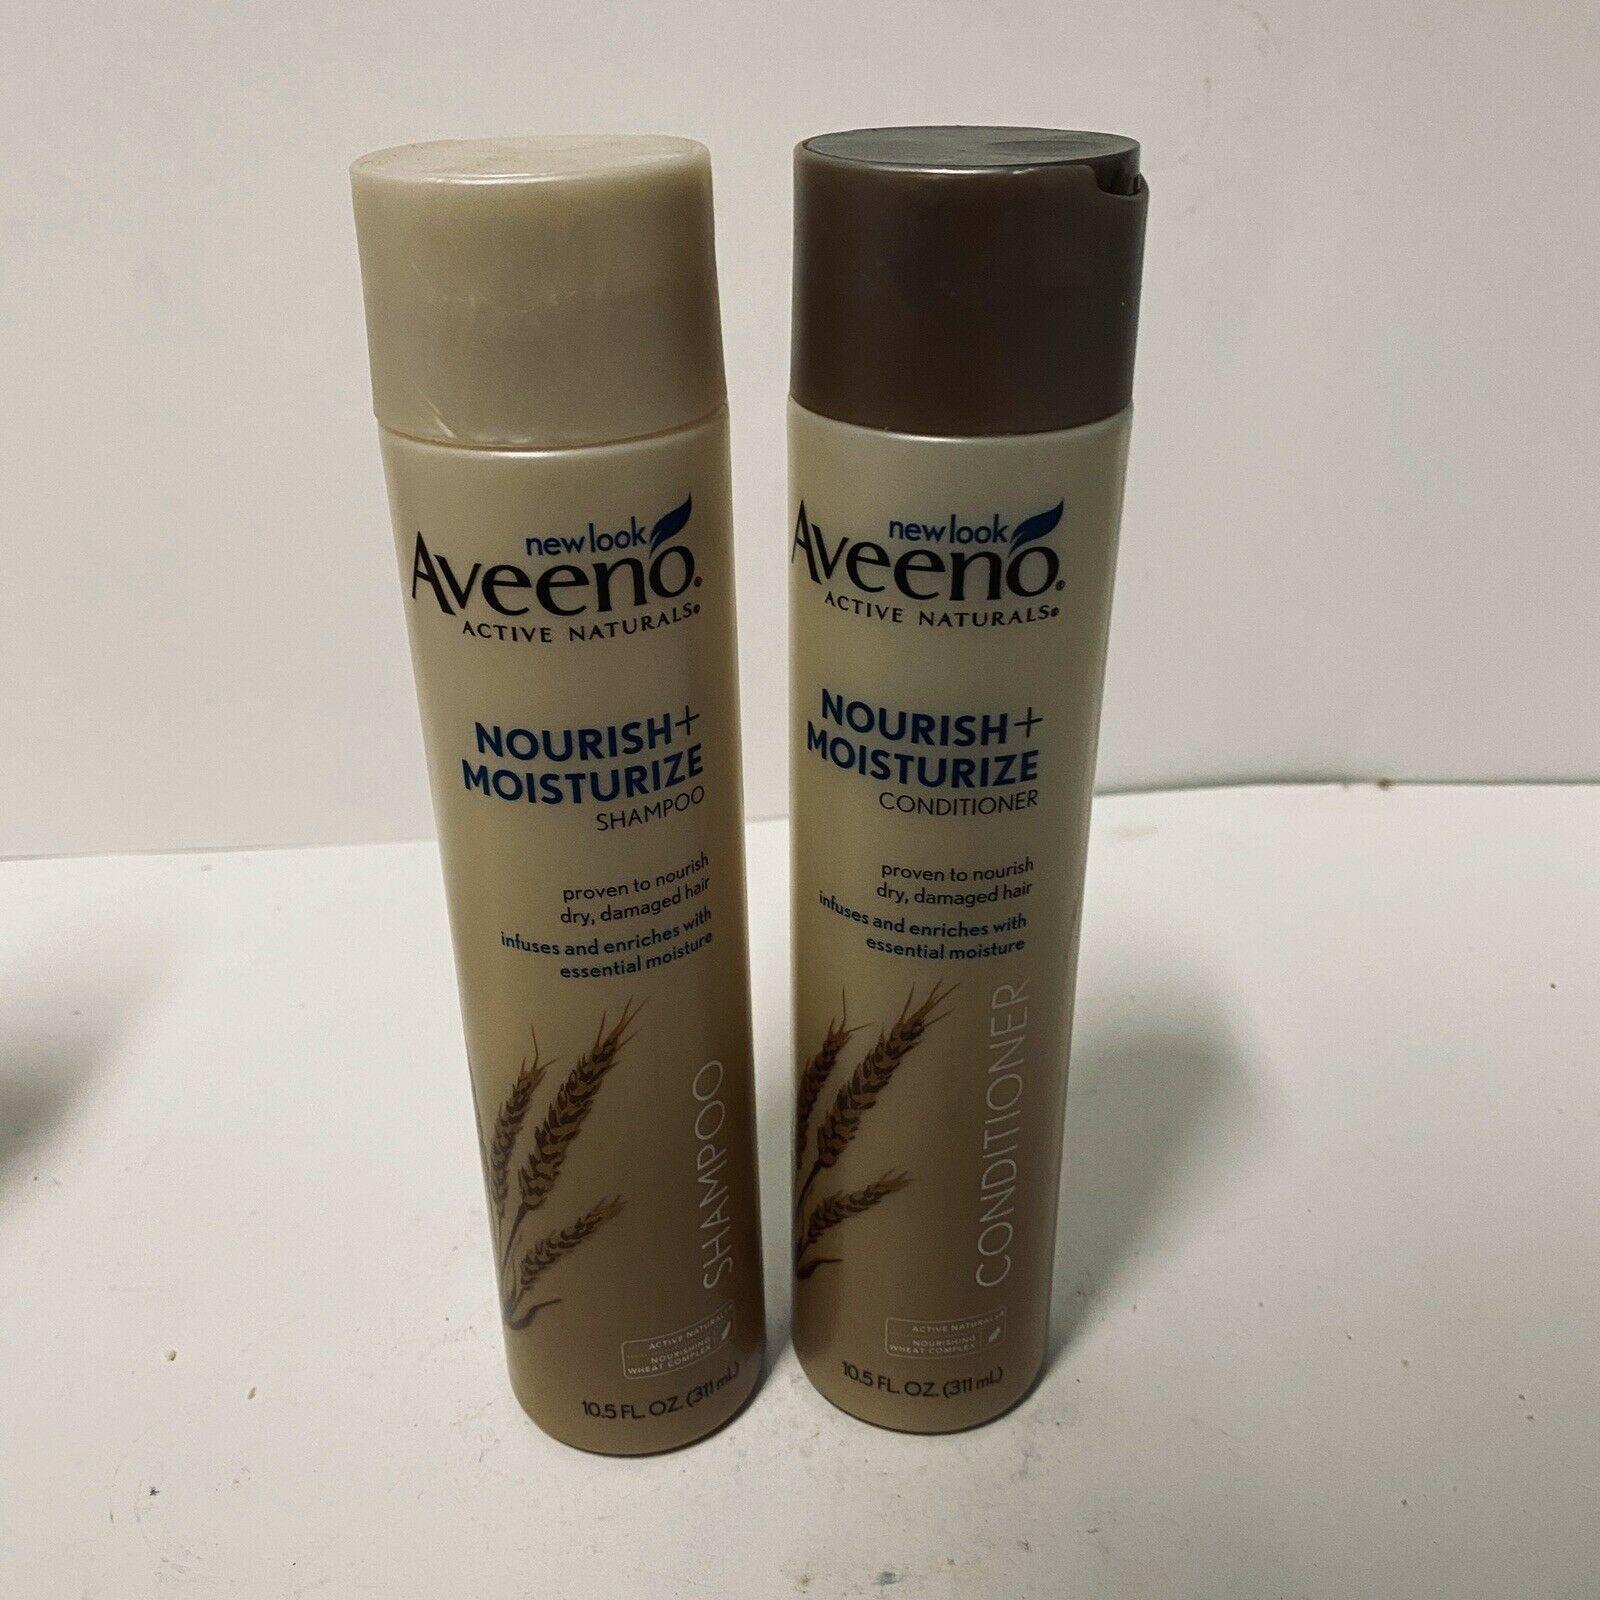 Aveeno Active Naturals Nourish Moisturize Shampoo Conditioner - $79.99